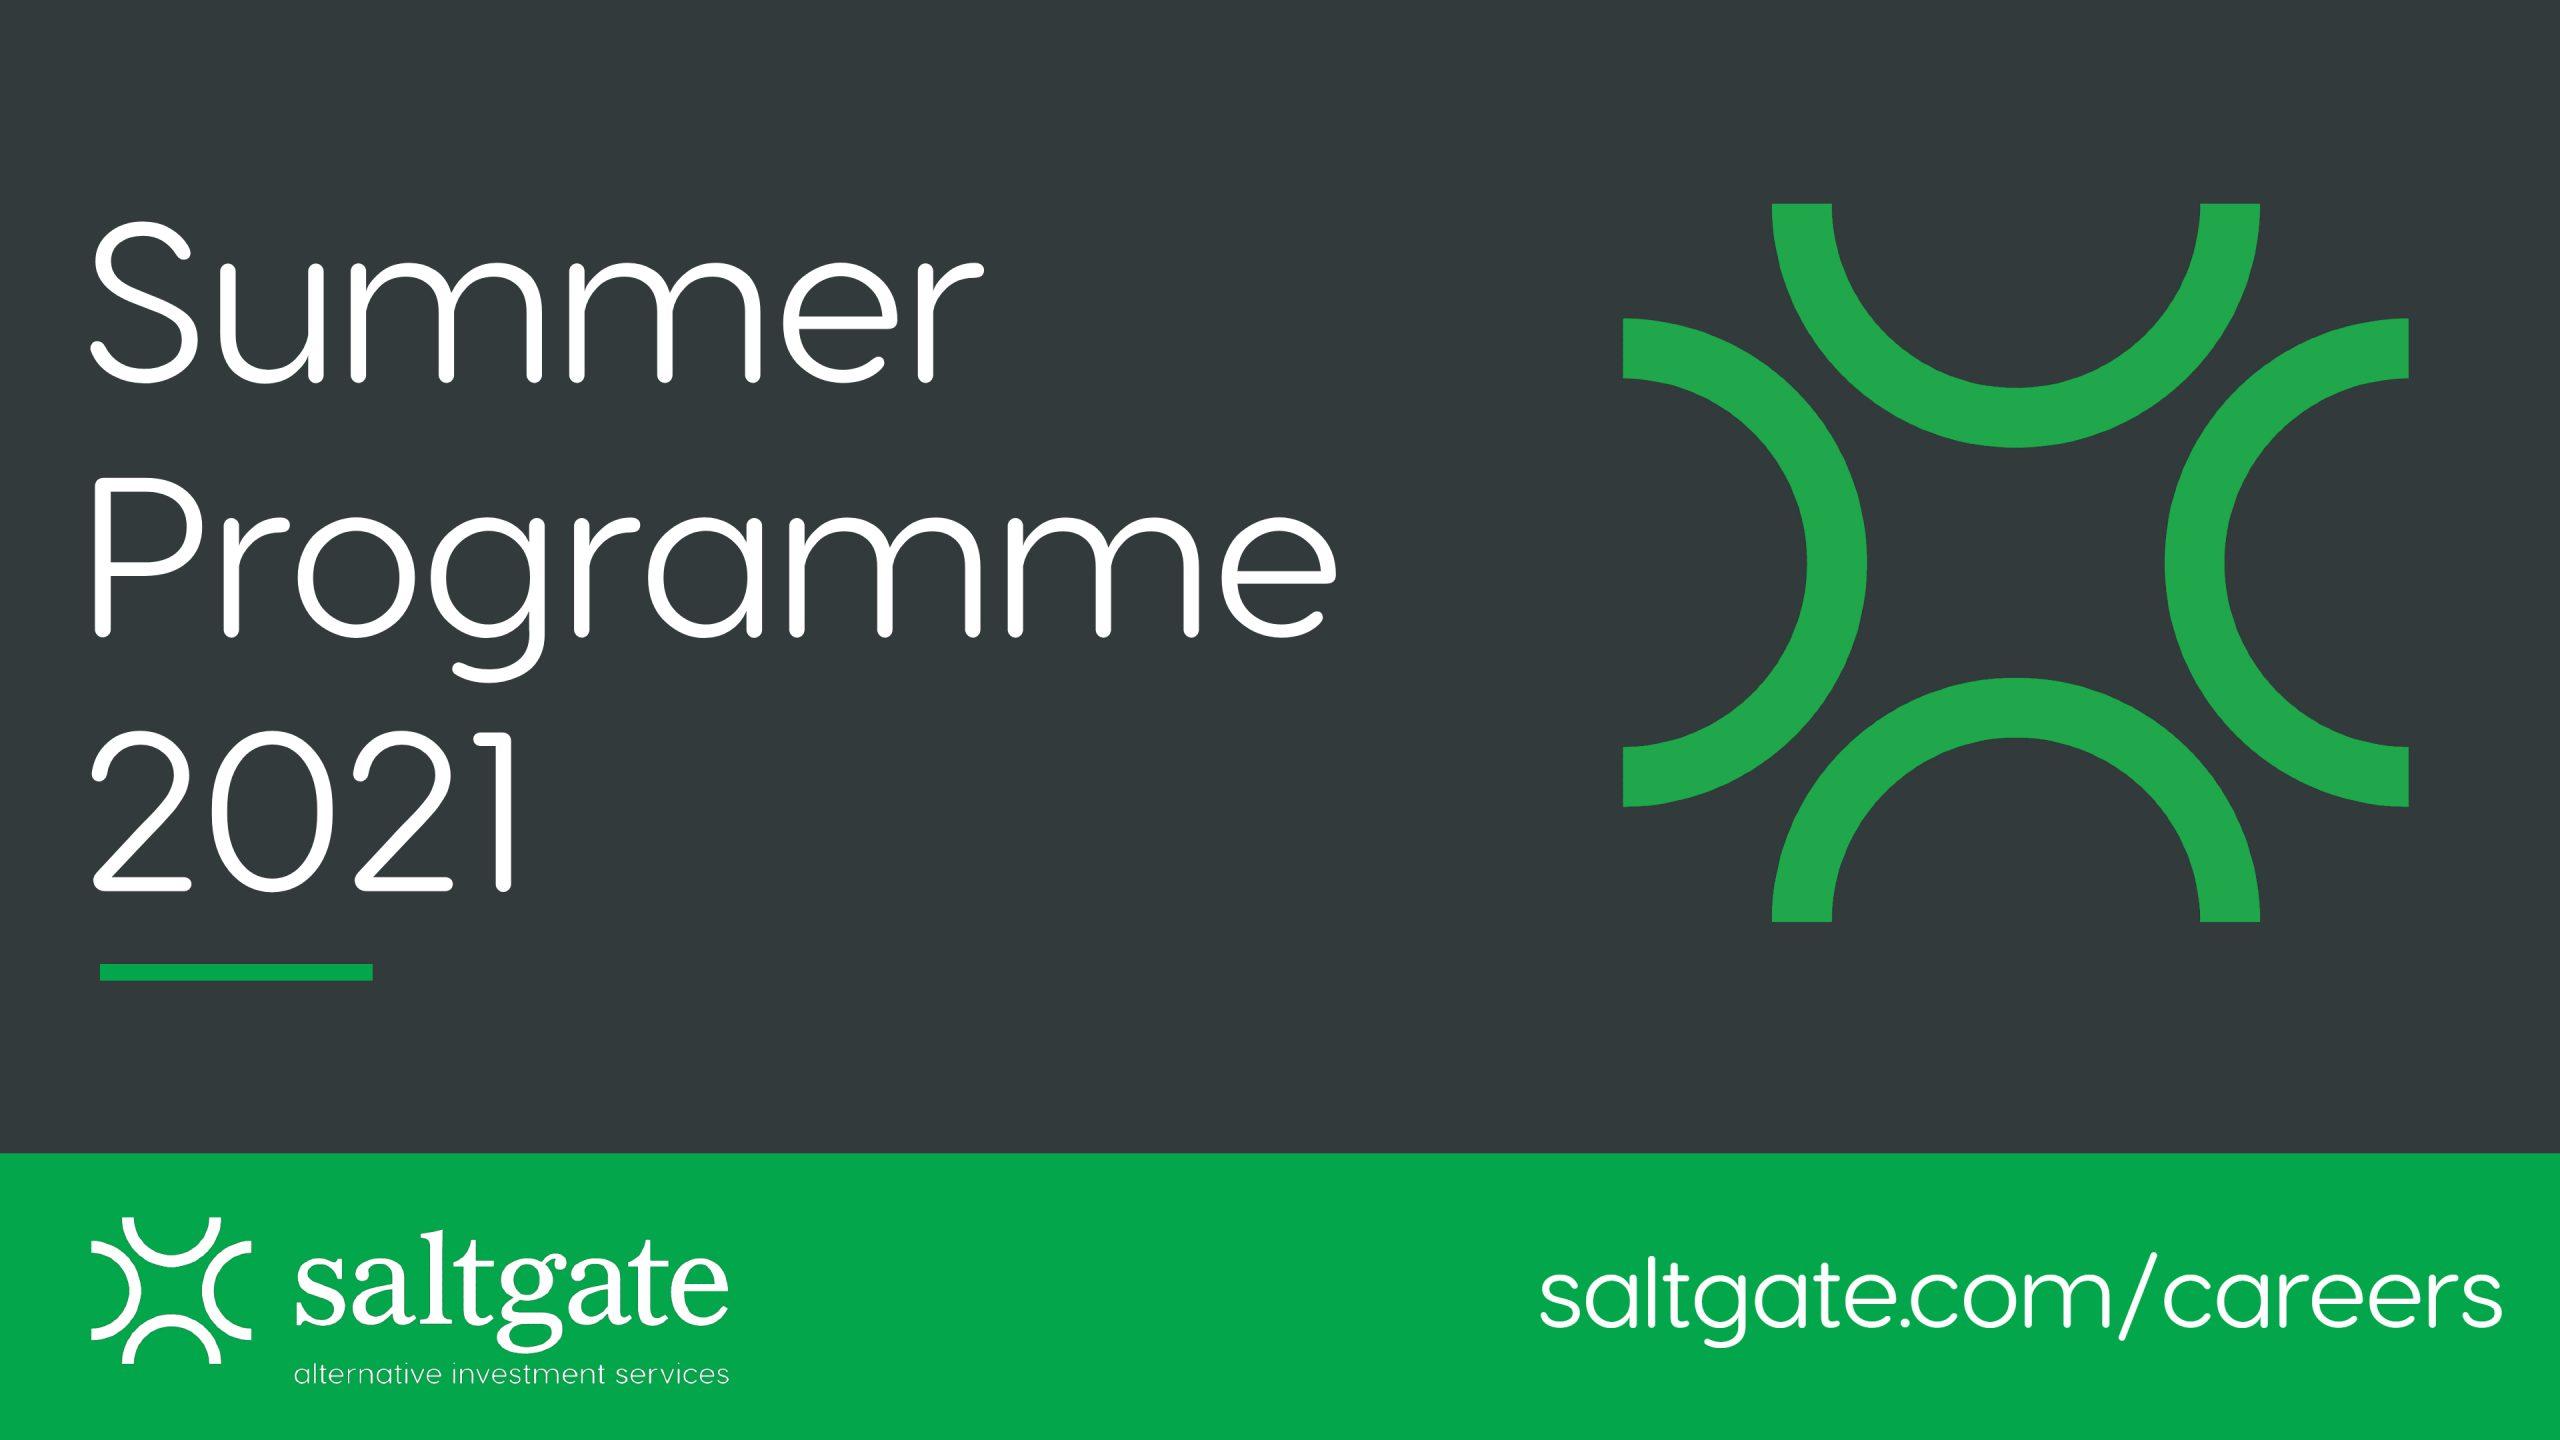 Summer Programme 2021 Graphic